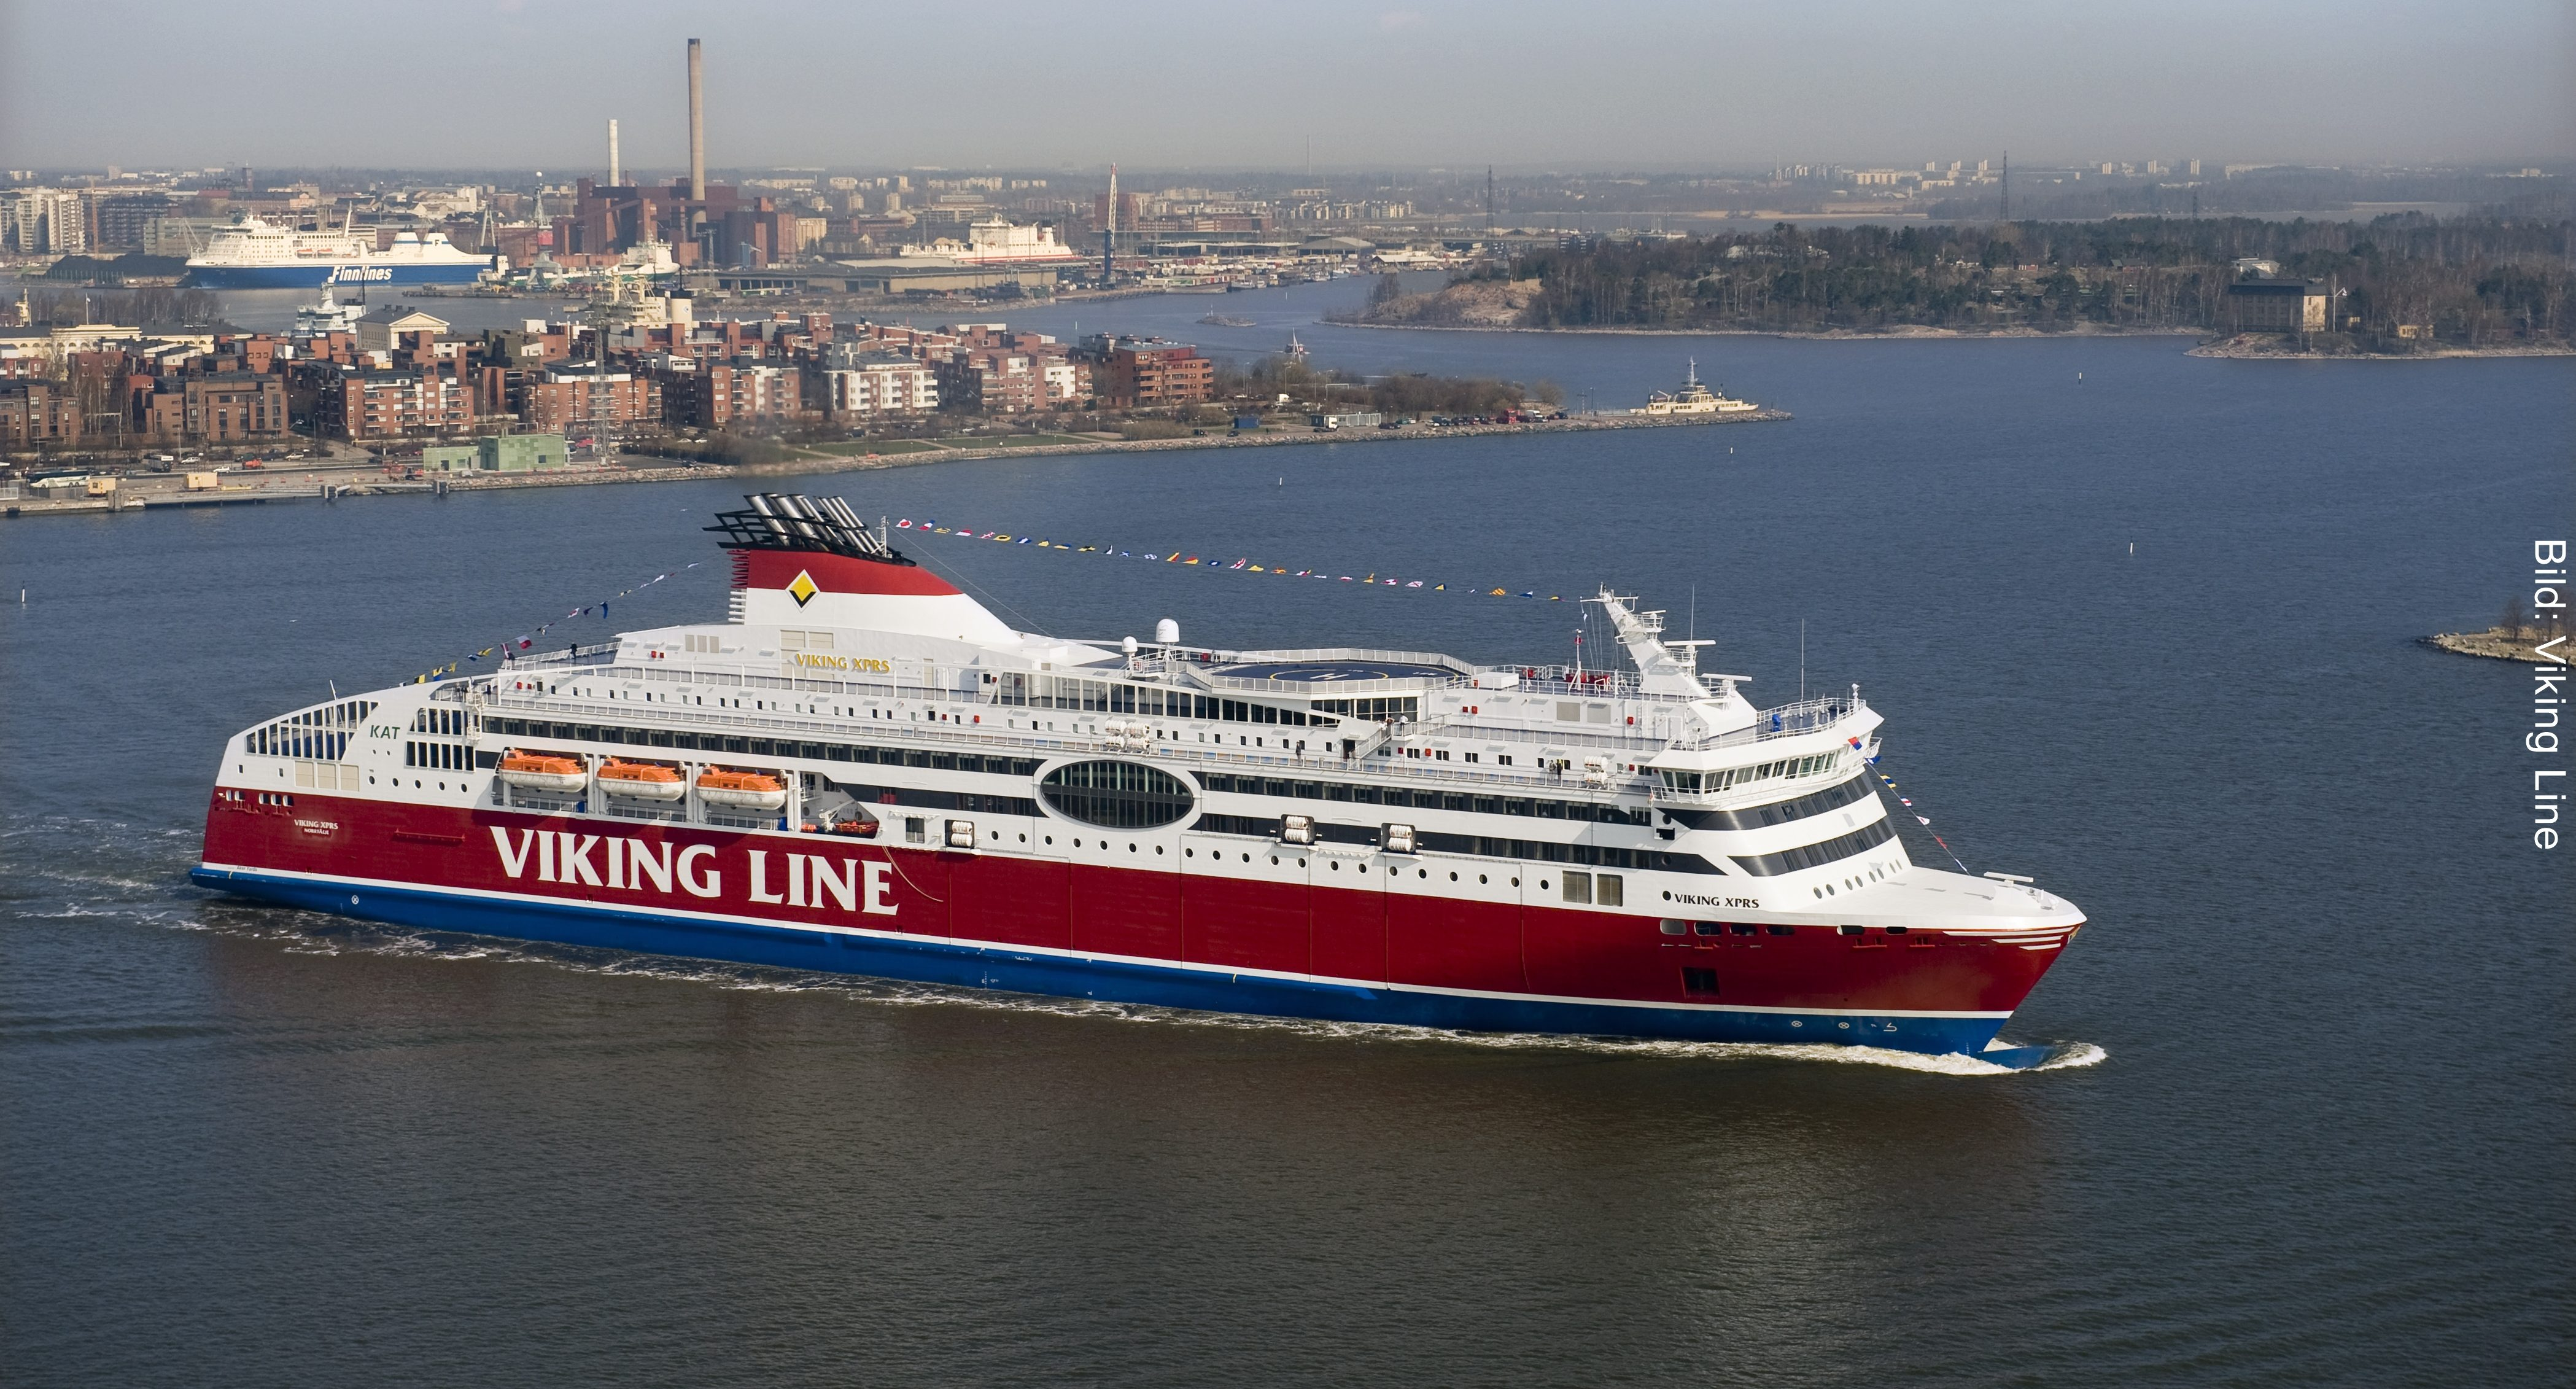 Helsinki Tallinna Viking Line